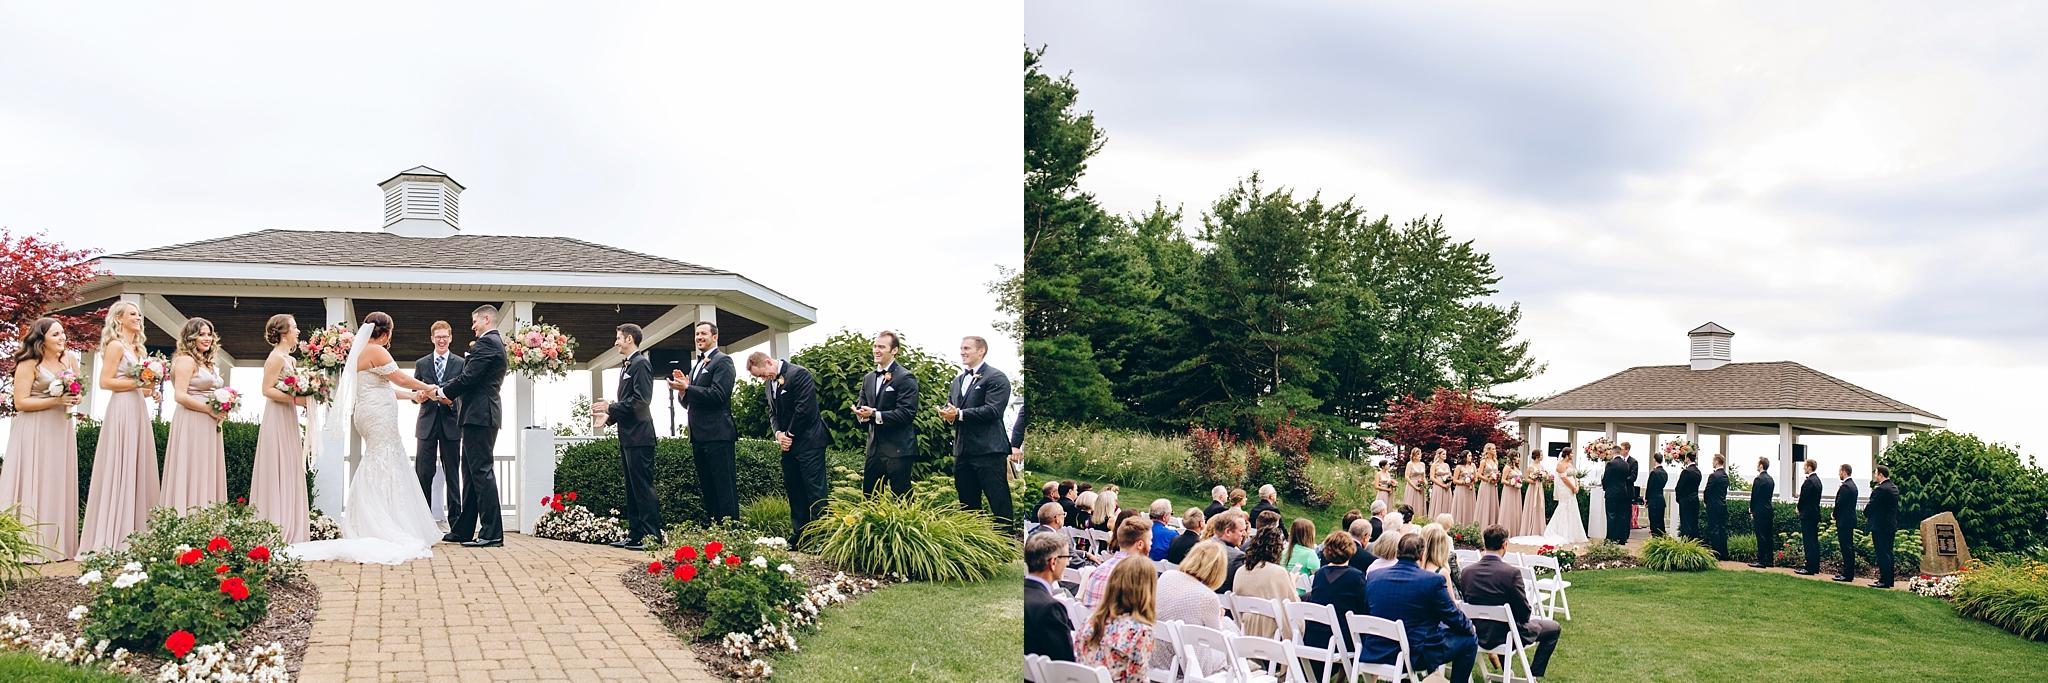 baker-lofts-holland-michigan-wedding-photographer_0355.jpg